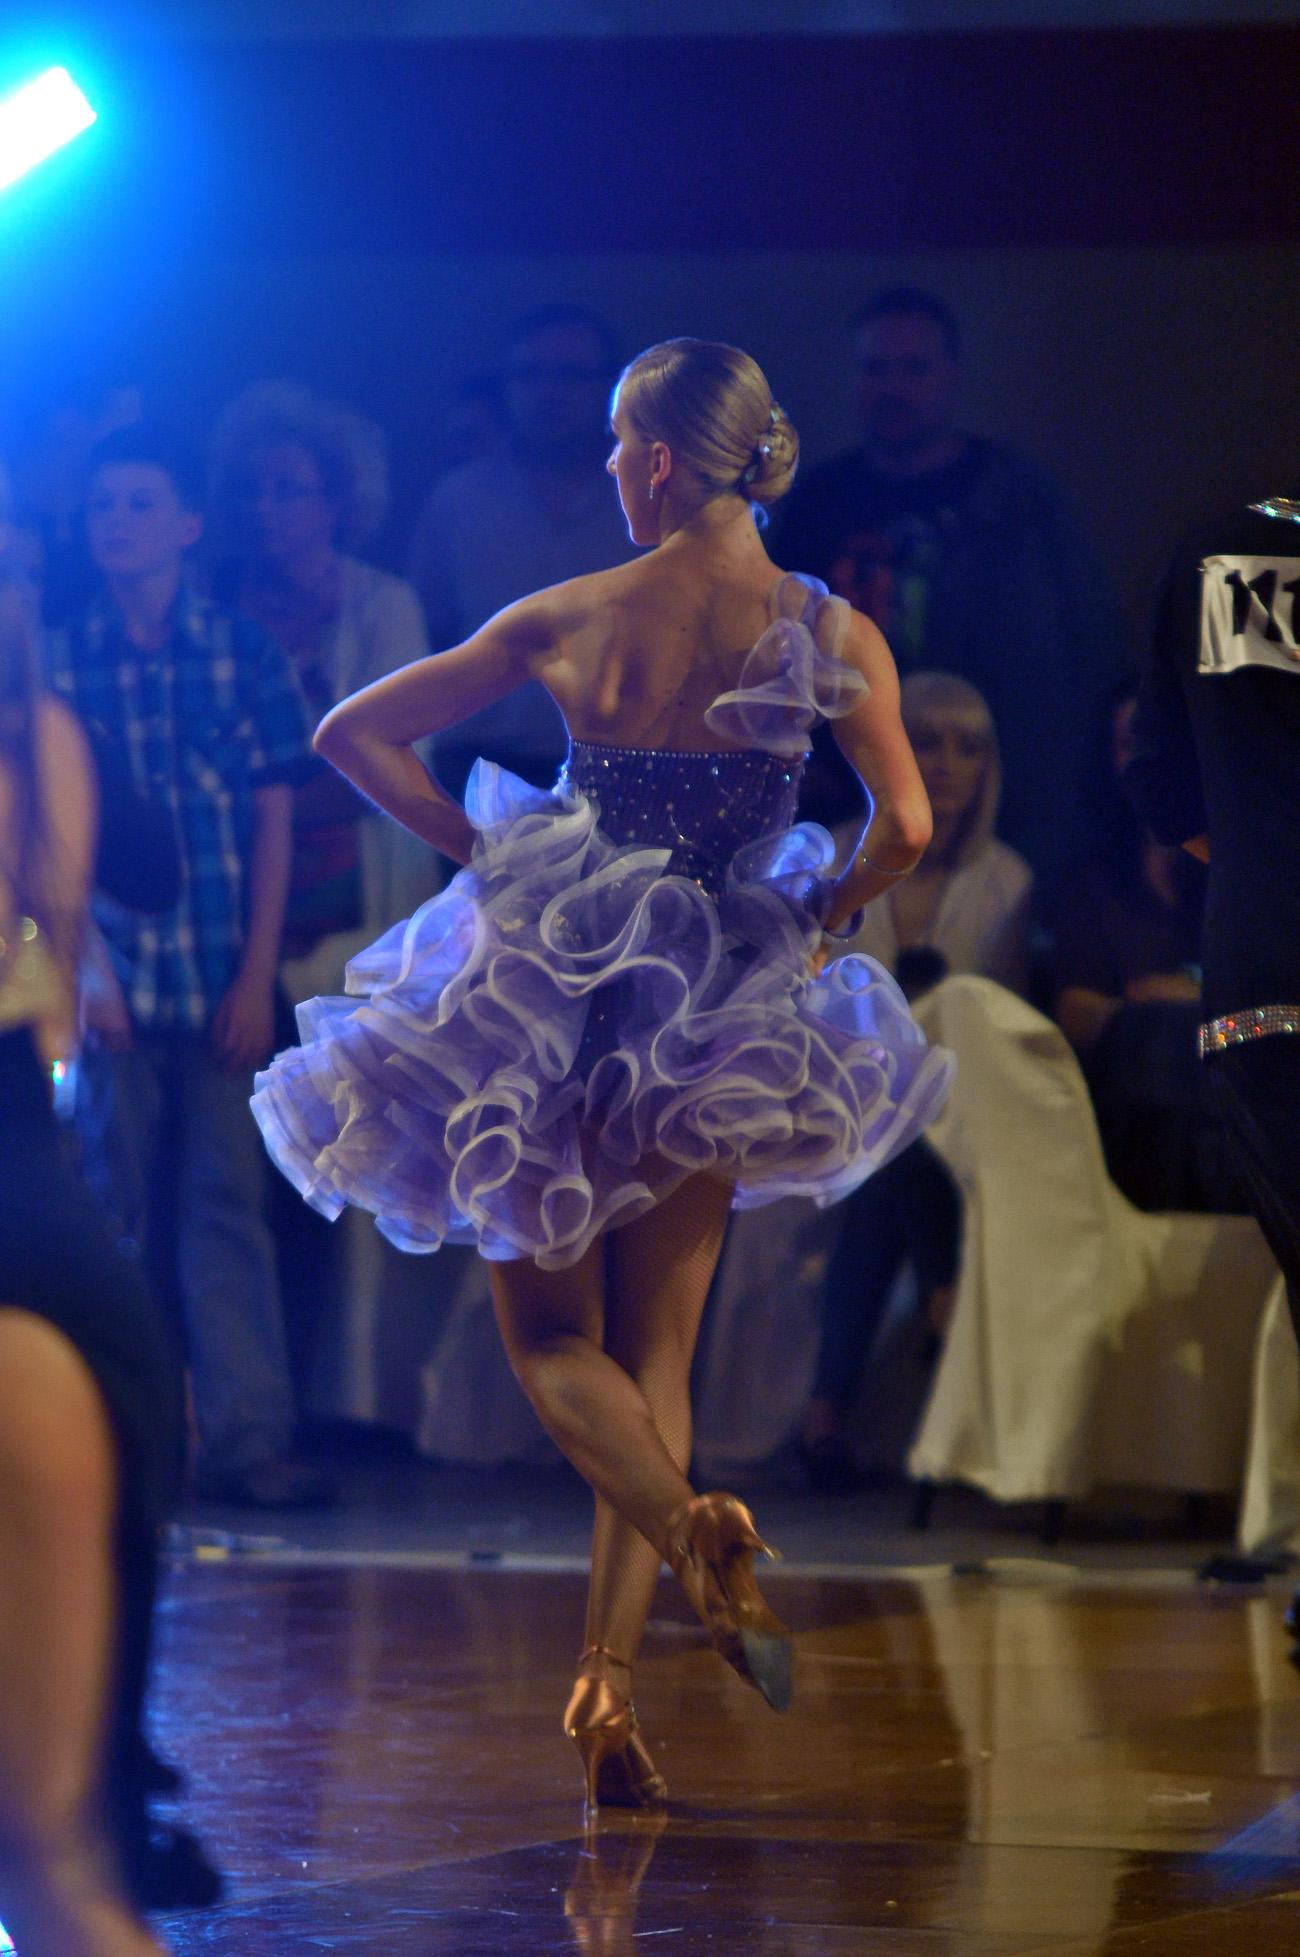 open-bydgoszcz-dance-cup-b2-061